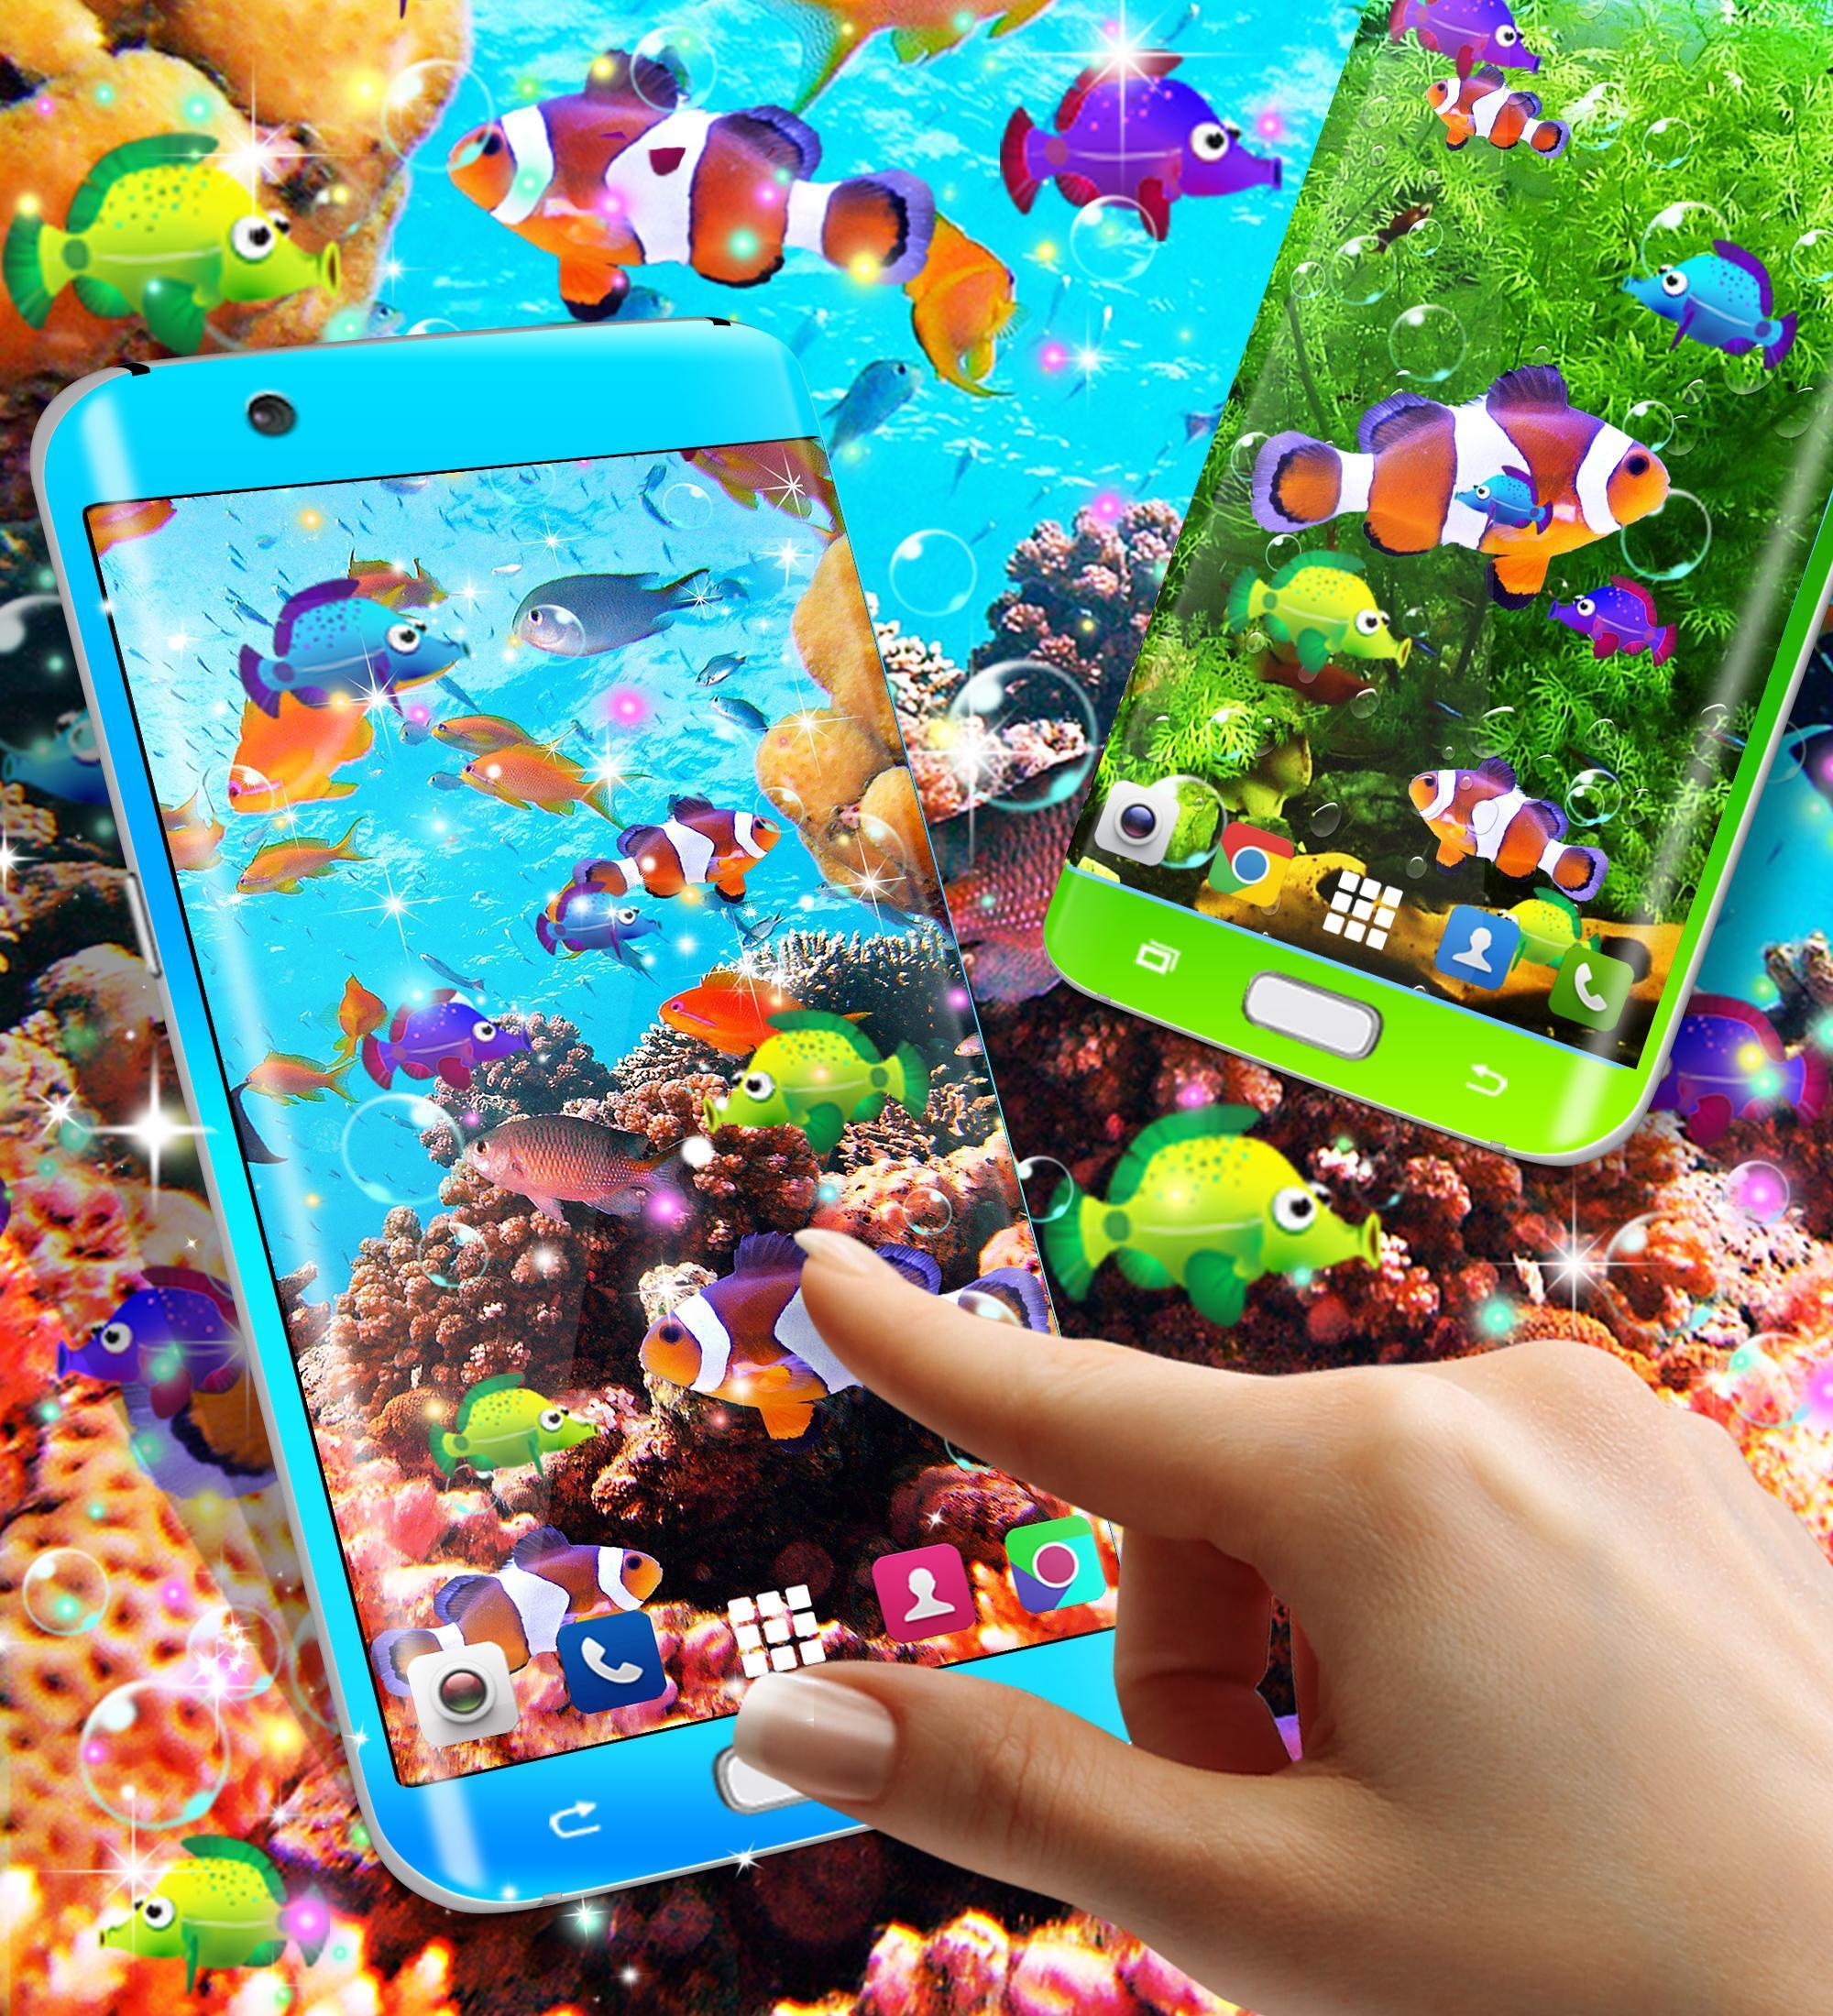 Download 45 Wallpaper Android Hidup Paling Keren